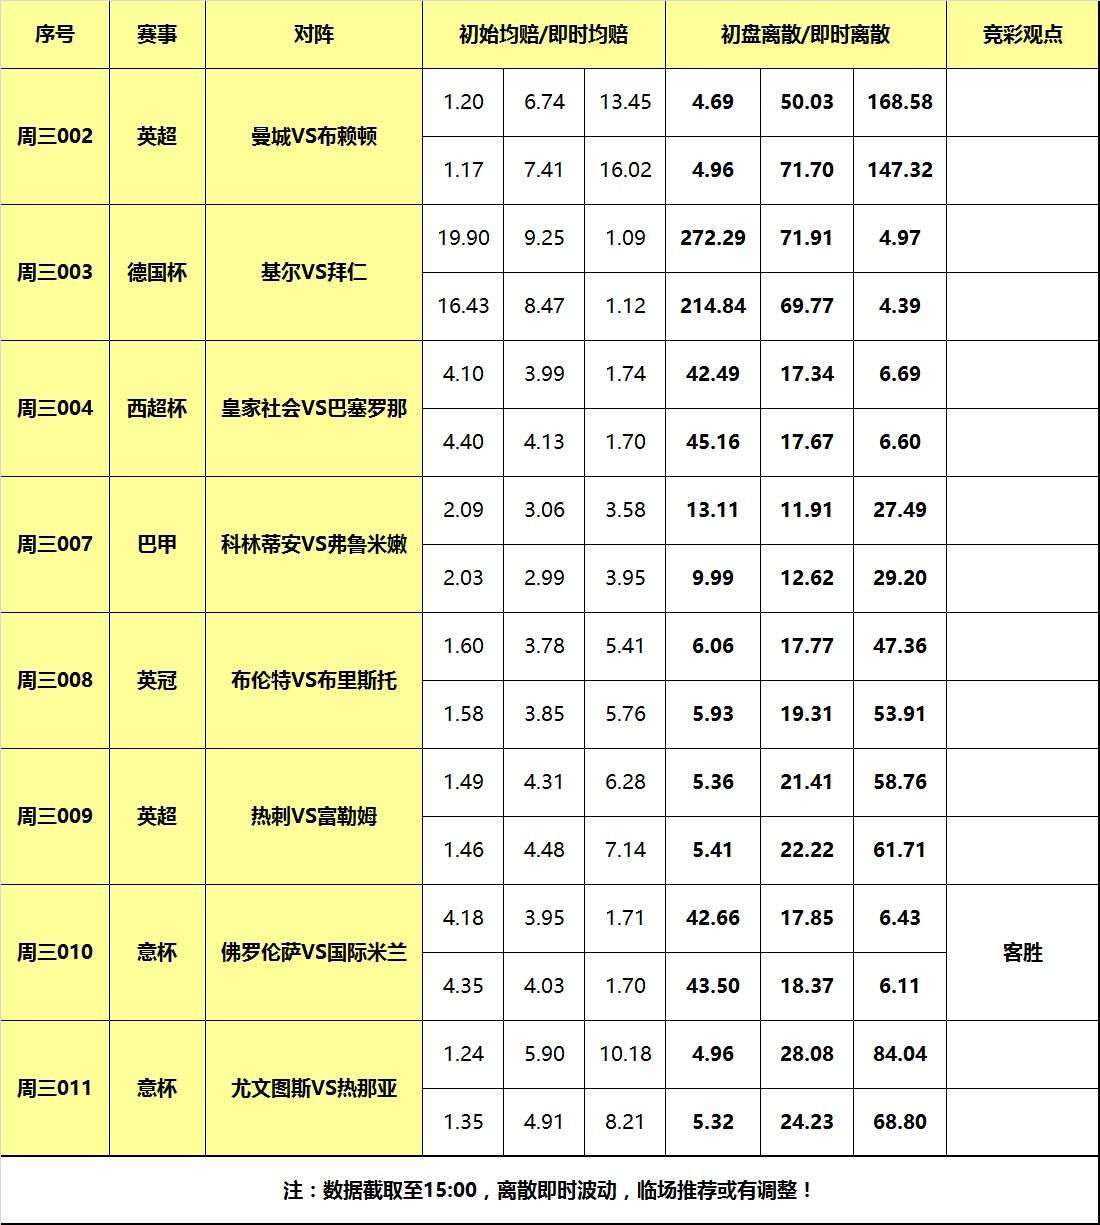 https://cdn.ttyingqiu.com/news/image/2021/1/13/202101131637000001.jpg